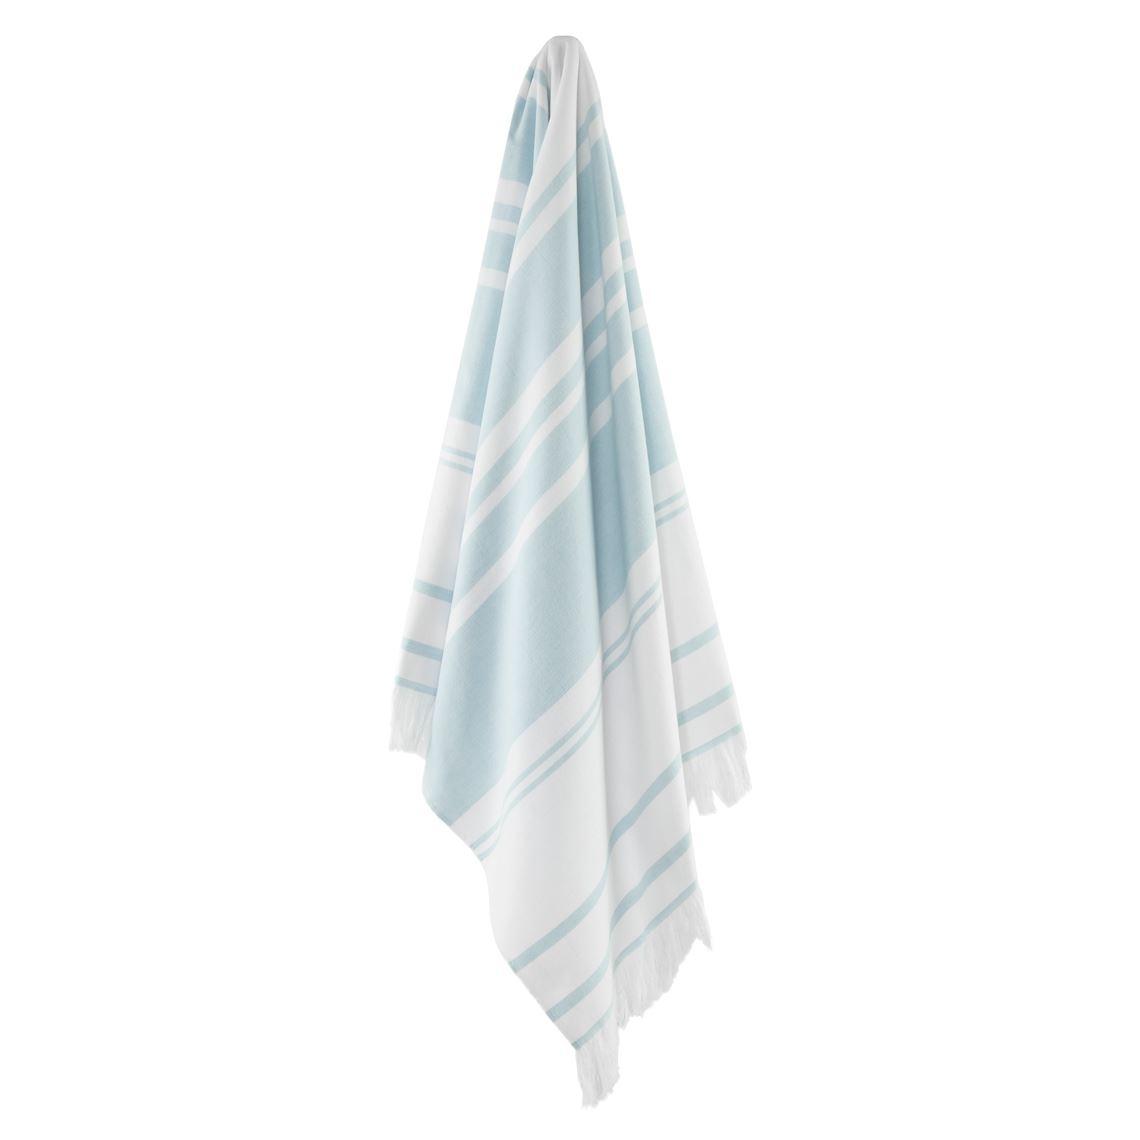 Bellagio Hammam Towel Size W 12cm x D 42cm x H 12cm in Light Blue Freedom